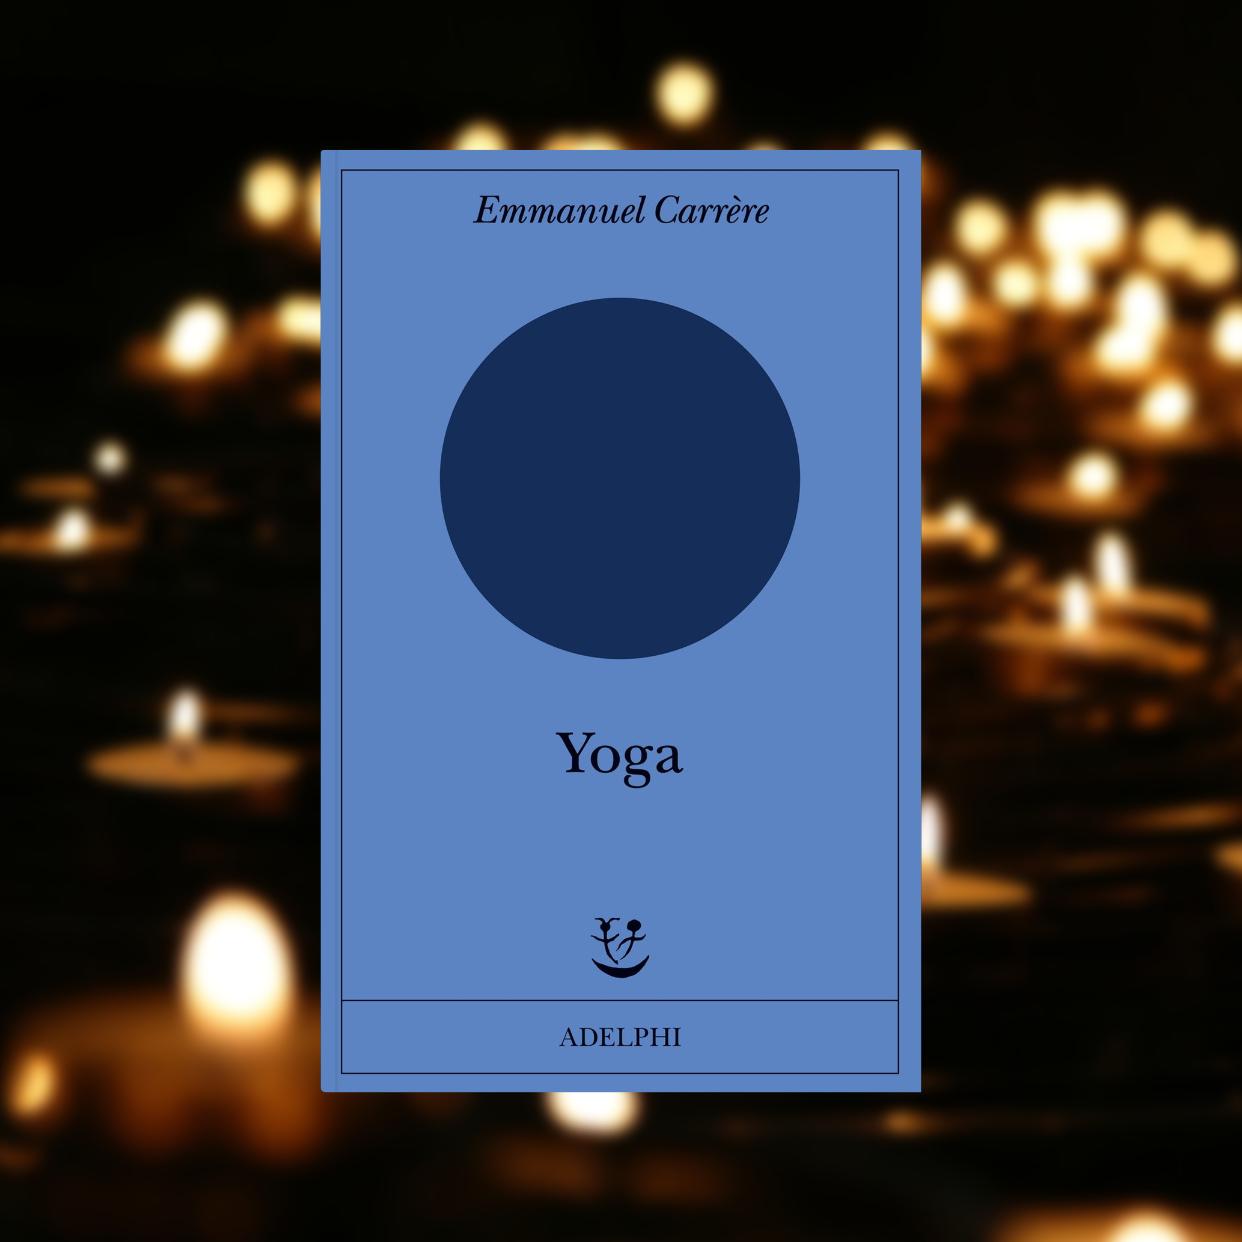 Meditazione vs caos della realtà: Yoga di Emmanuel Carrère